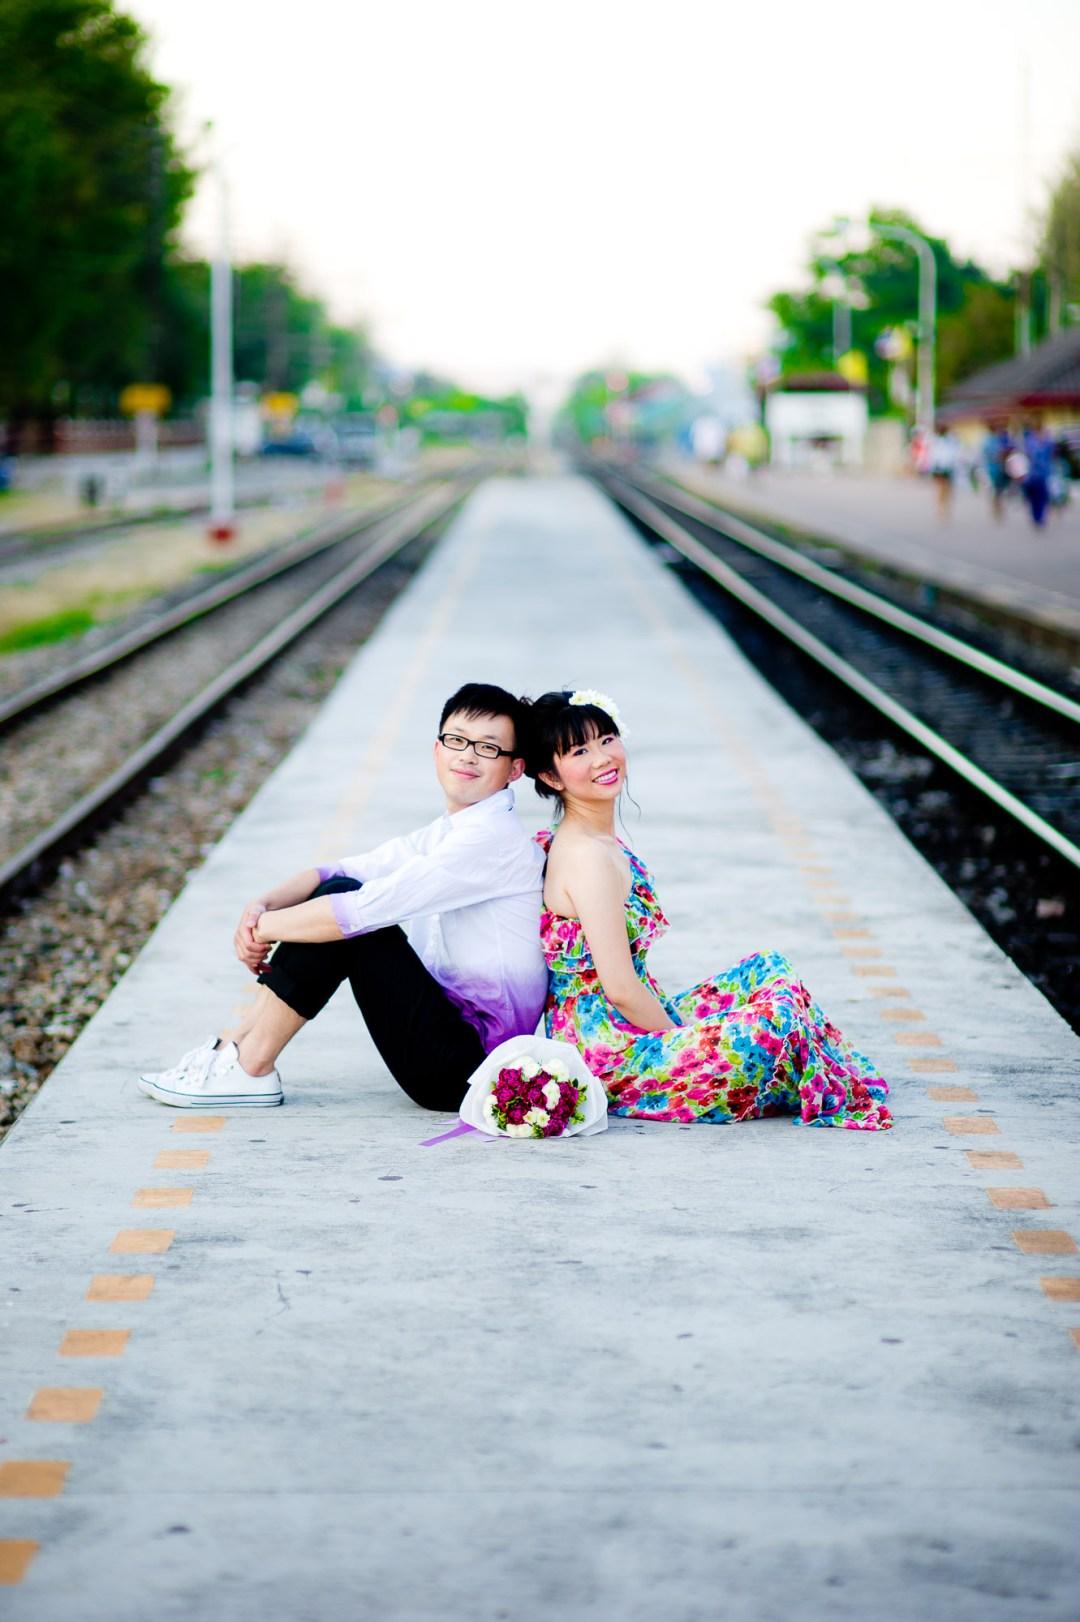 Hua Hin Wedding Photography | Hua Hin Train Station Engagement Session